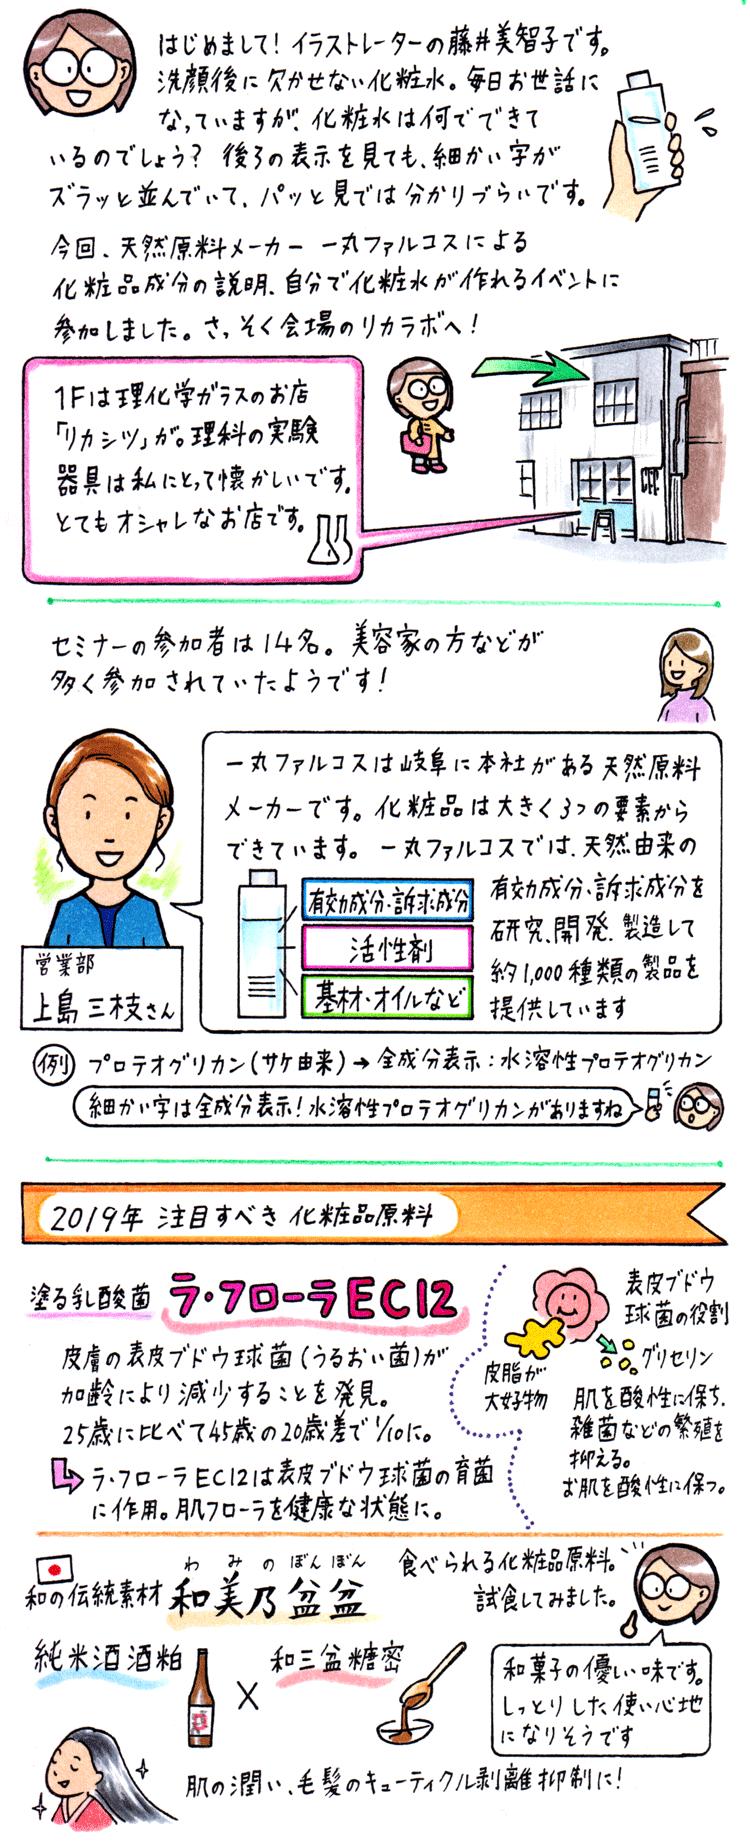 img01-3